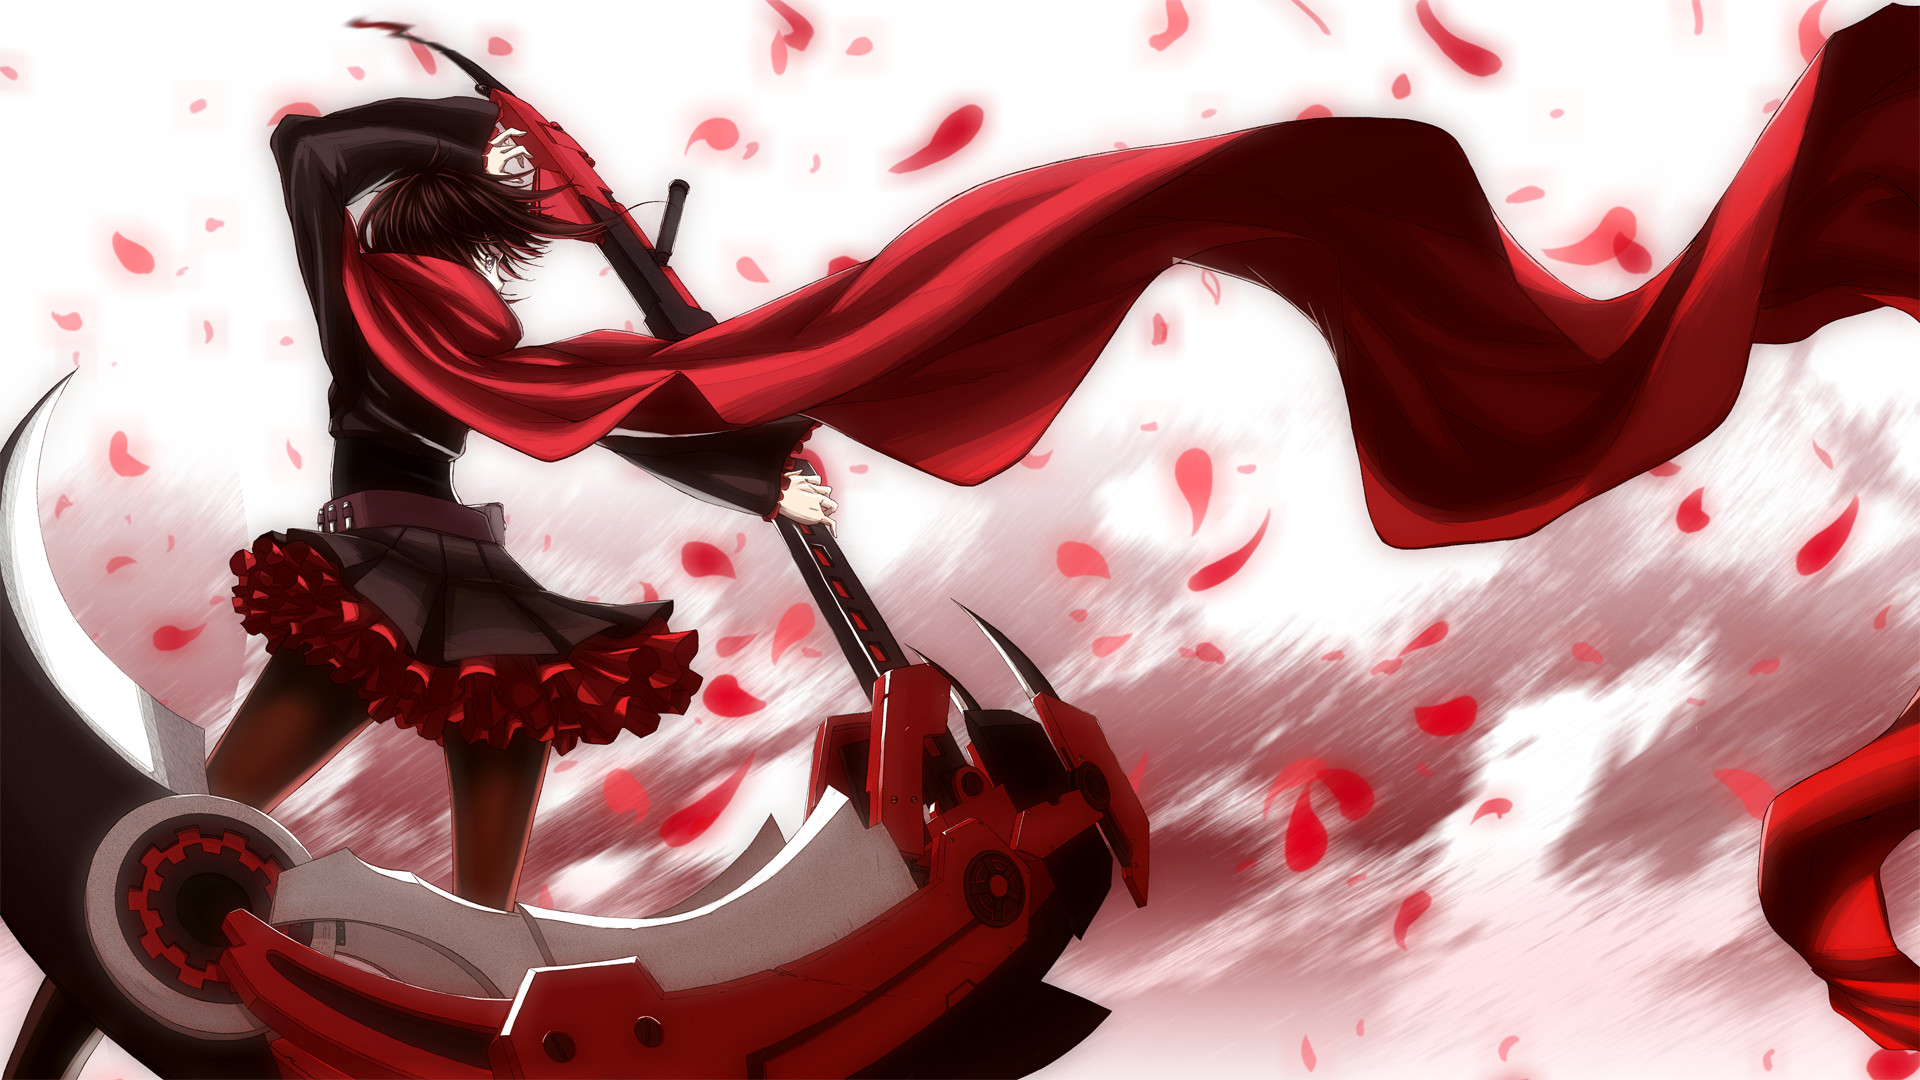 Anime RWBY Ruby Rose Wallpaper